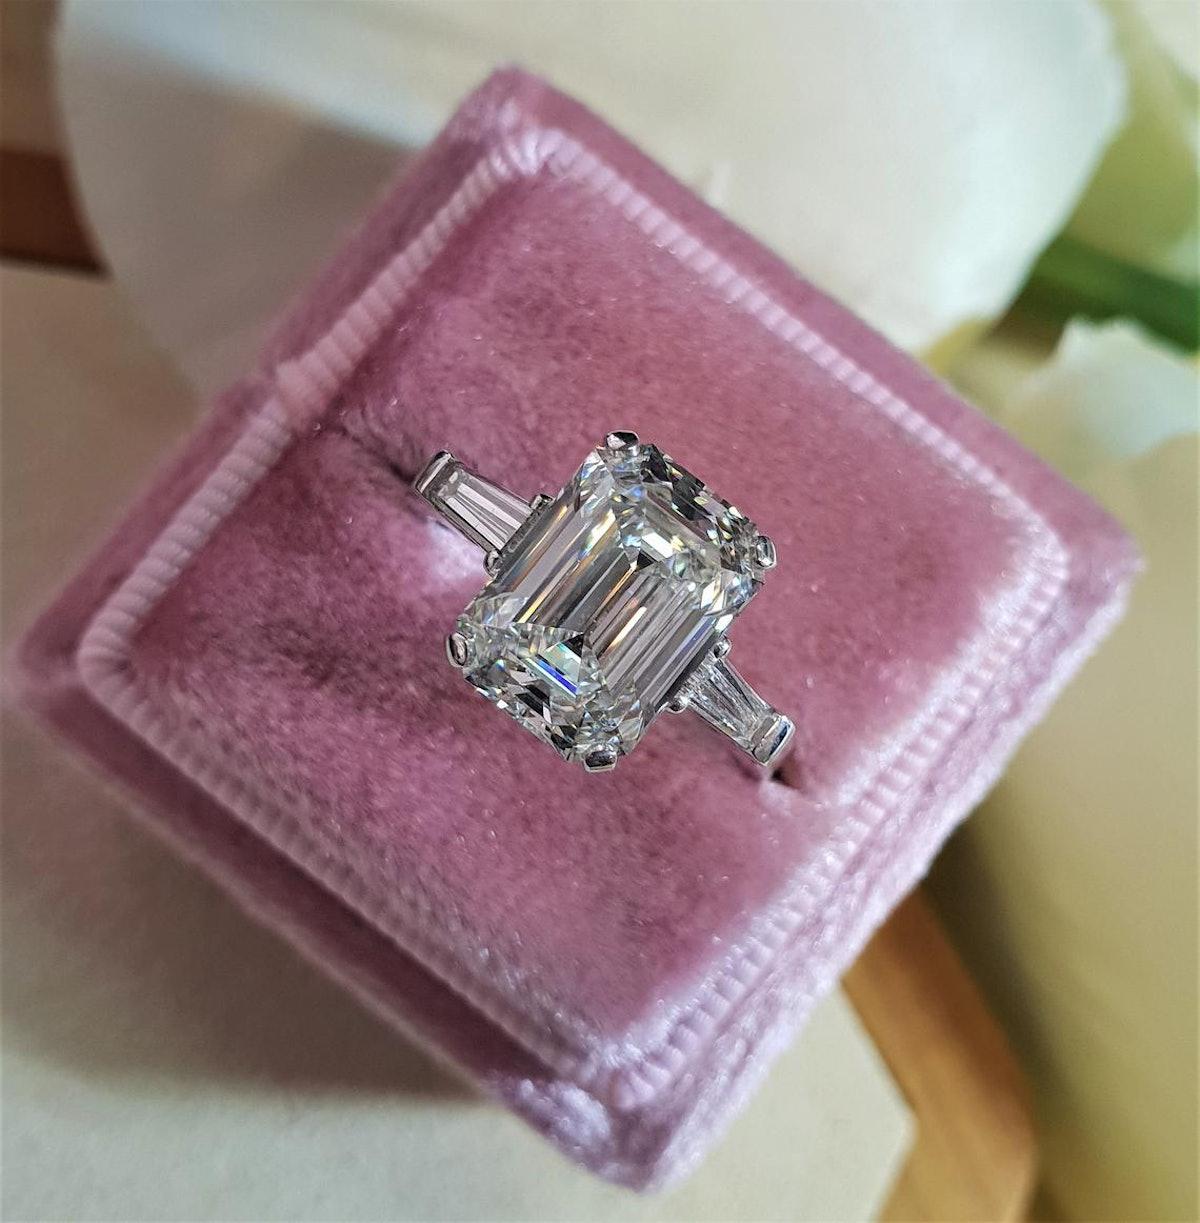 Emerald Cut Lab-Created Diamond Engagement Ring